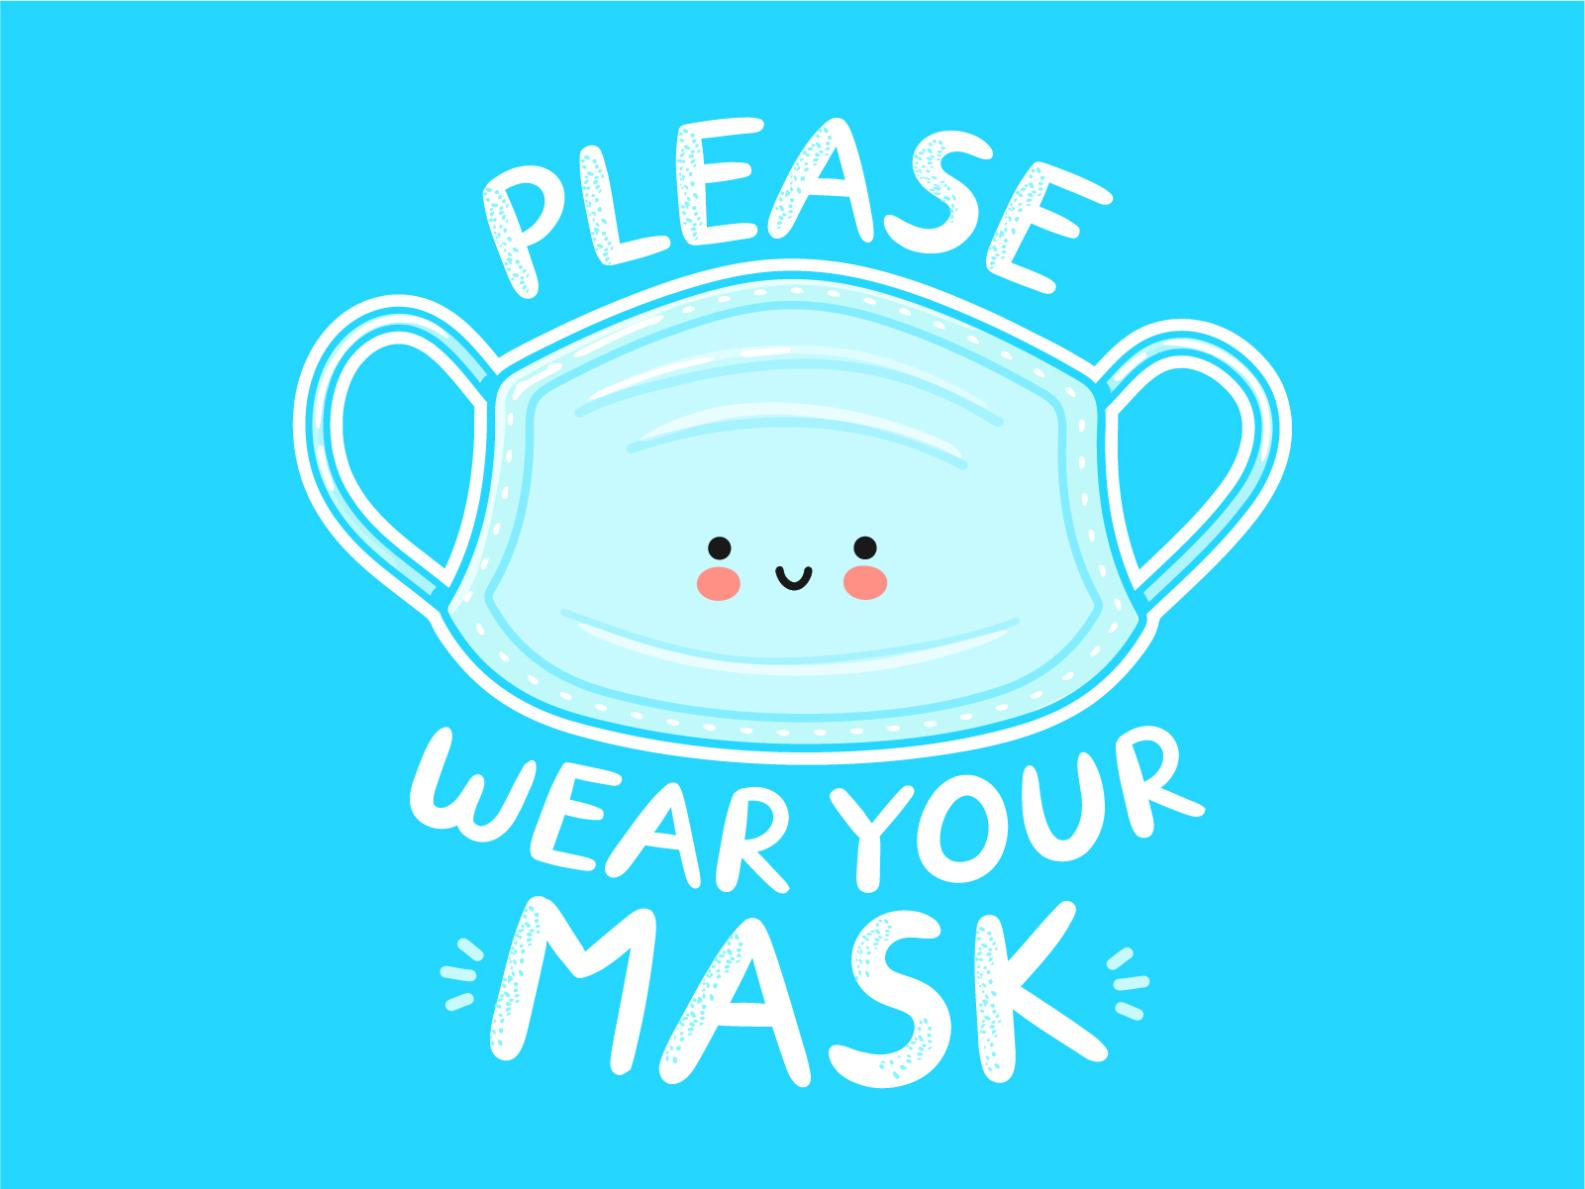 Wear your mask poster by Slava Svt on Dribbble